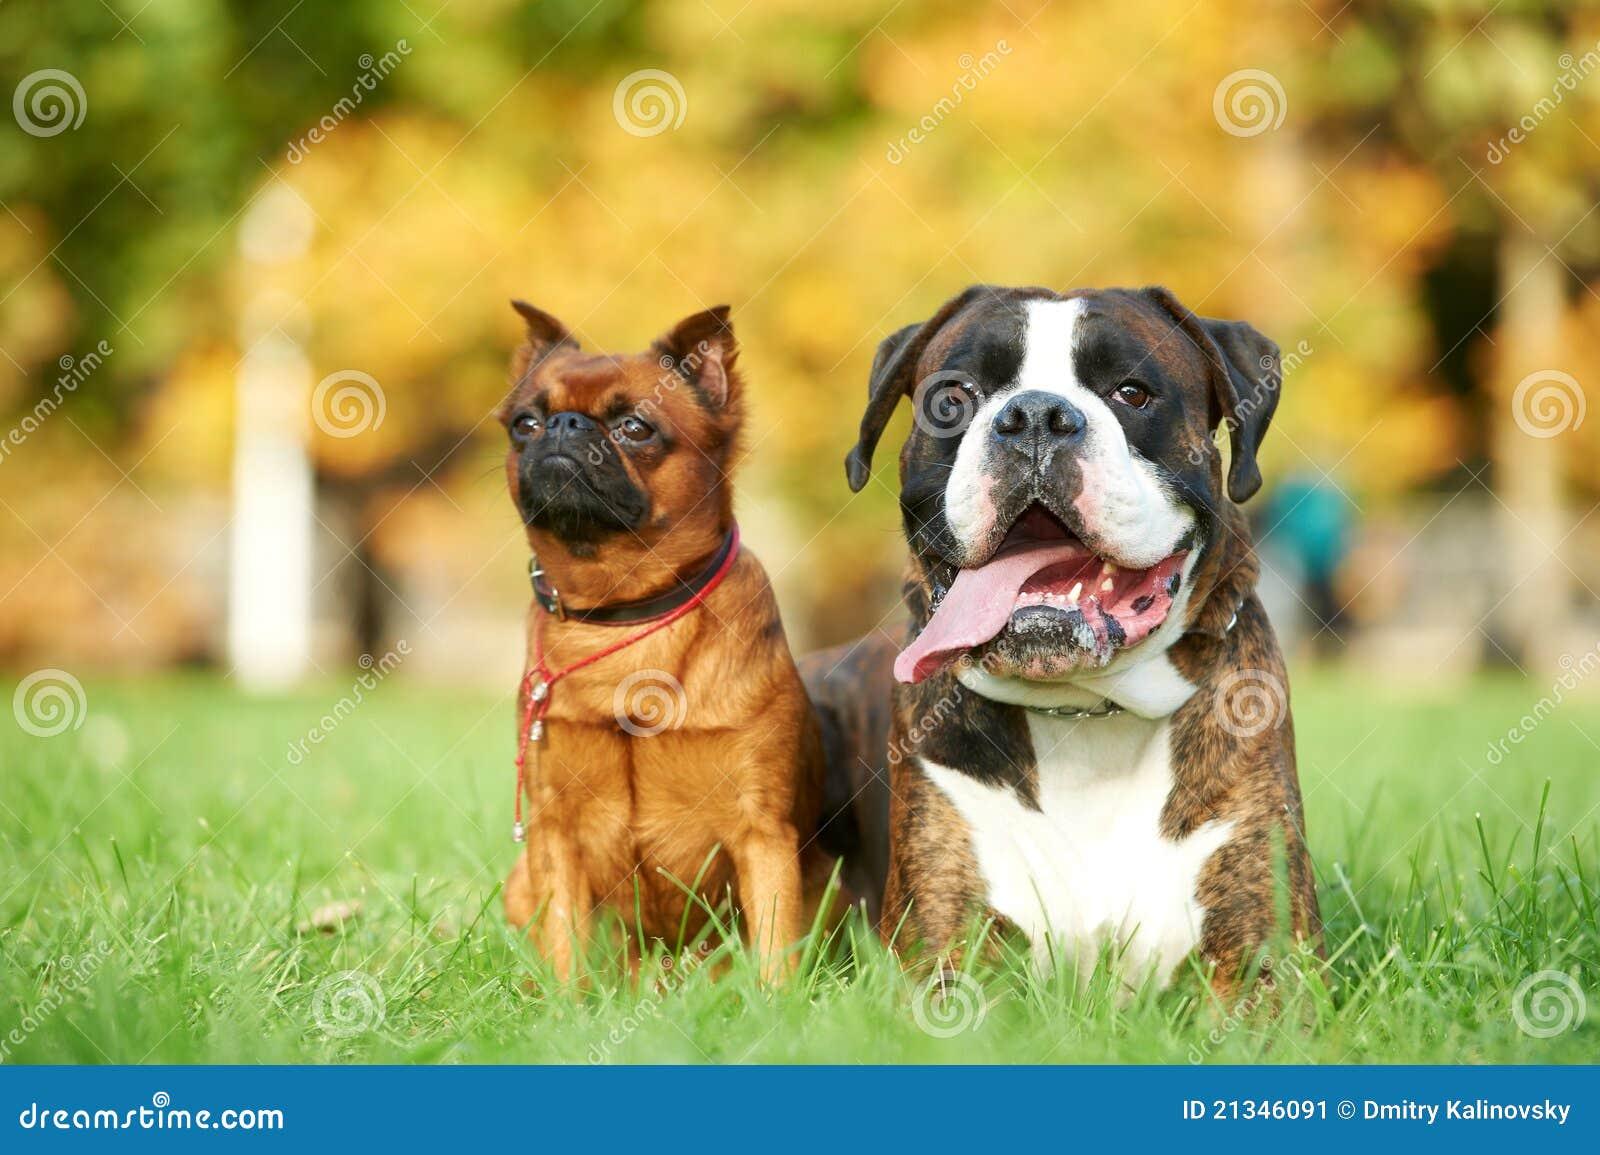 german tiger boxer dog and petit brabancon griffon stock image